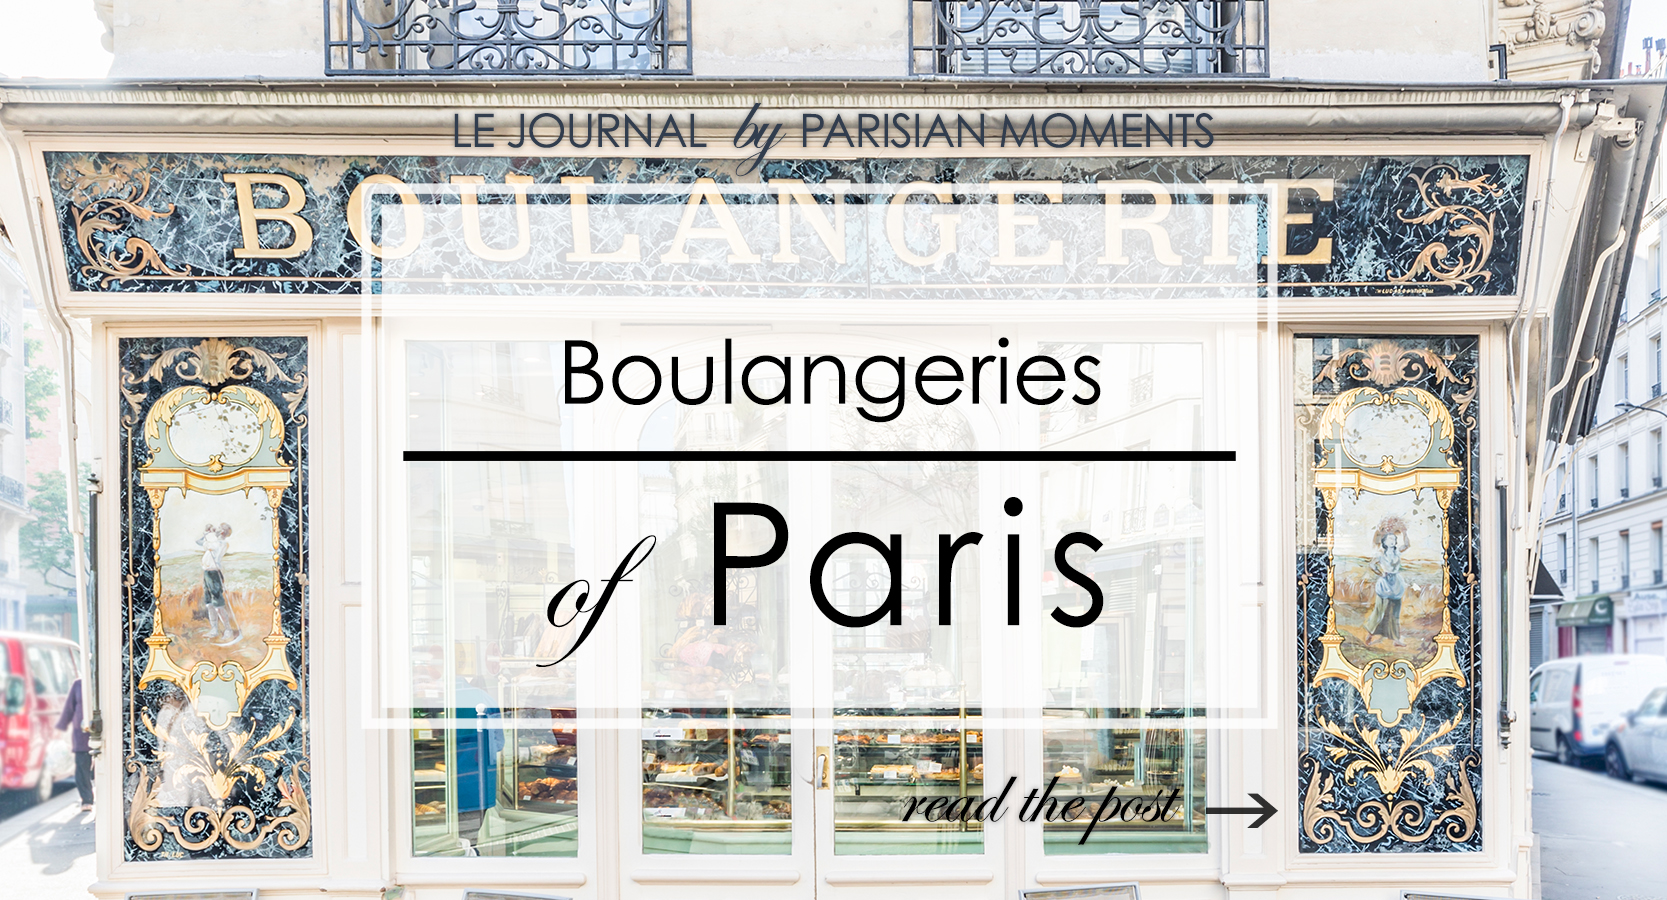 Boulangeries of Paris